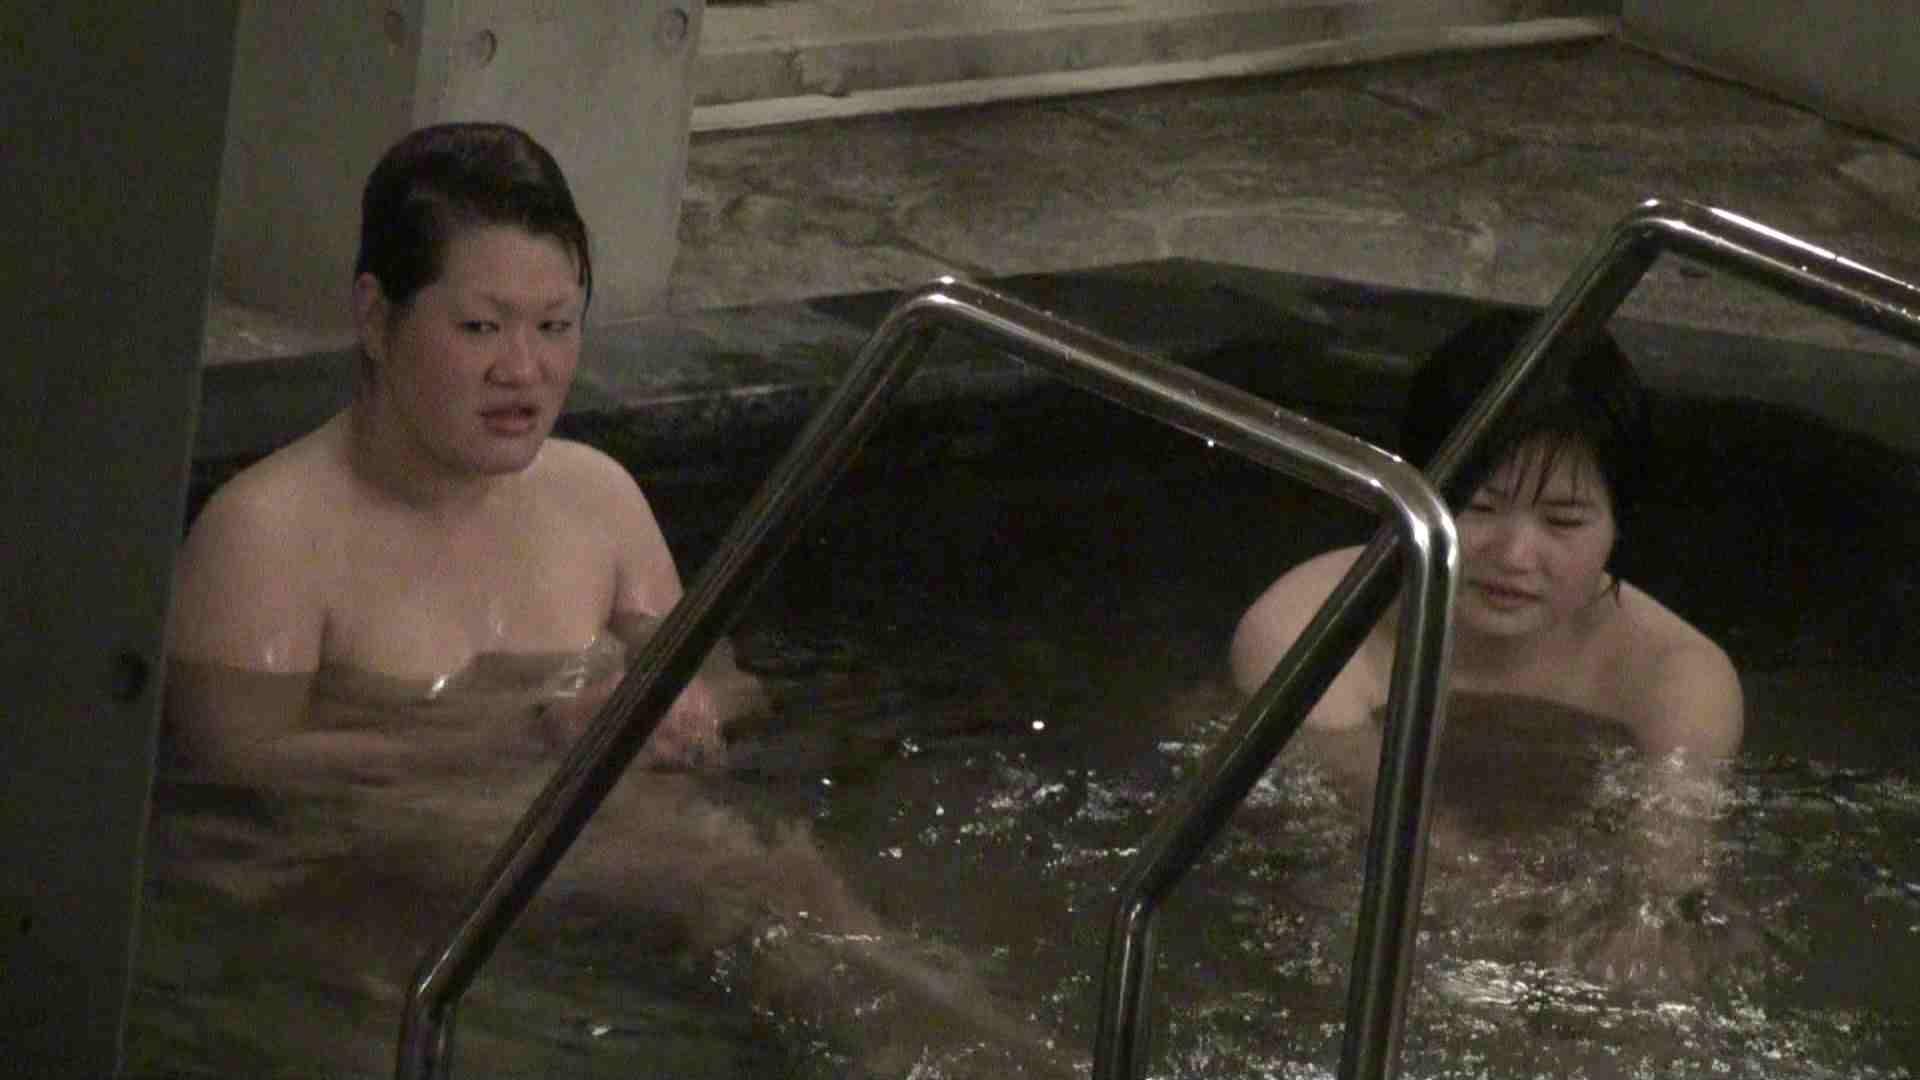 Aquaな露天風呂Vol.384 露天 盗撮オマンコ無修正動画無料 82連発 59